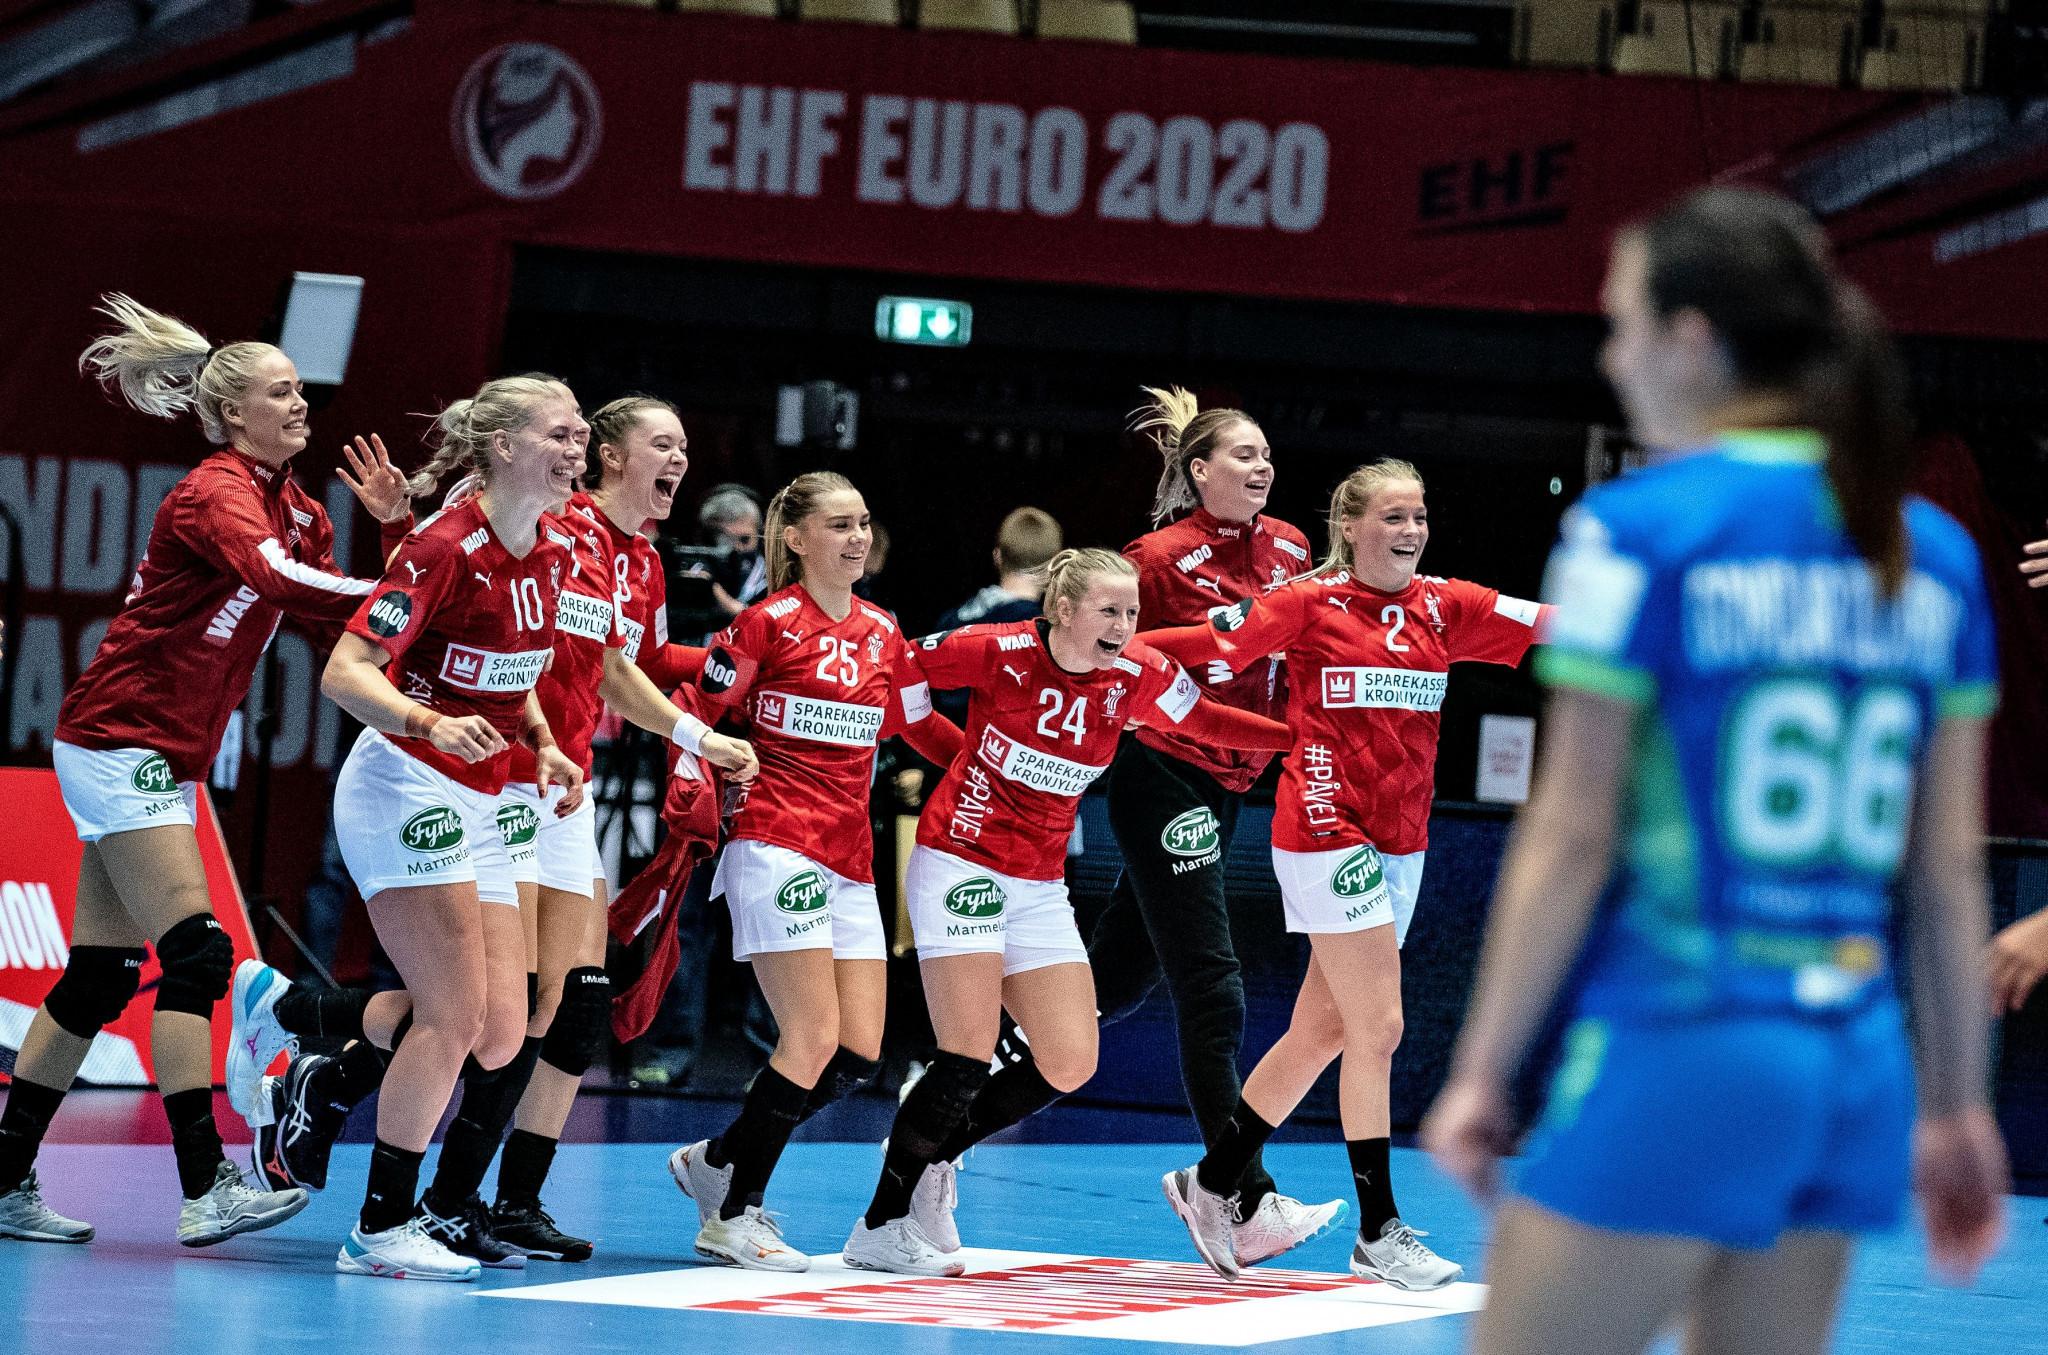 Serbia game at European Women's Handball Championship postponed over positive COVID-19 tests